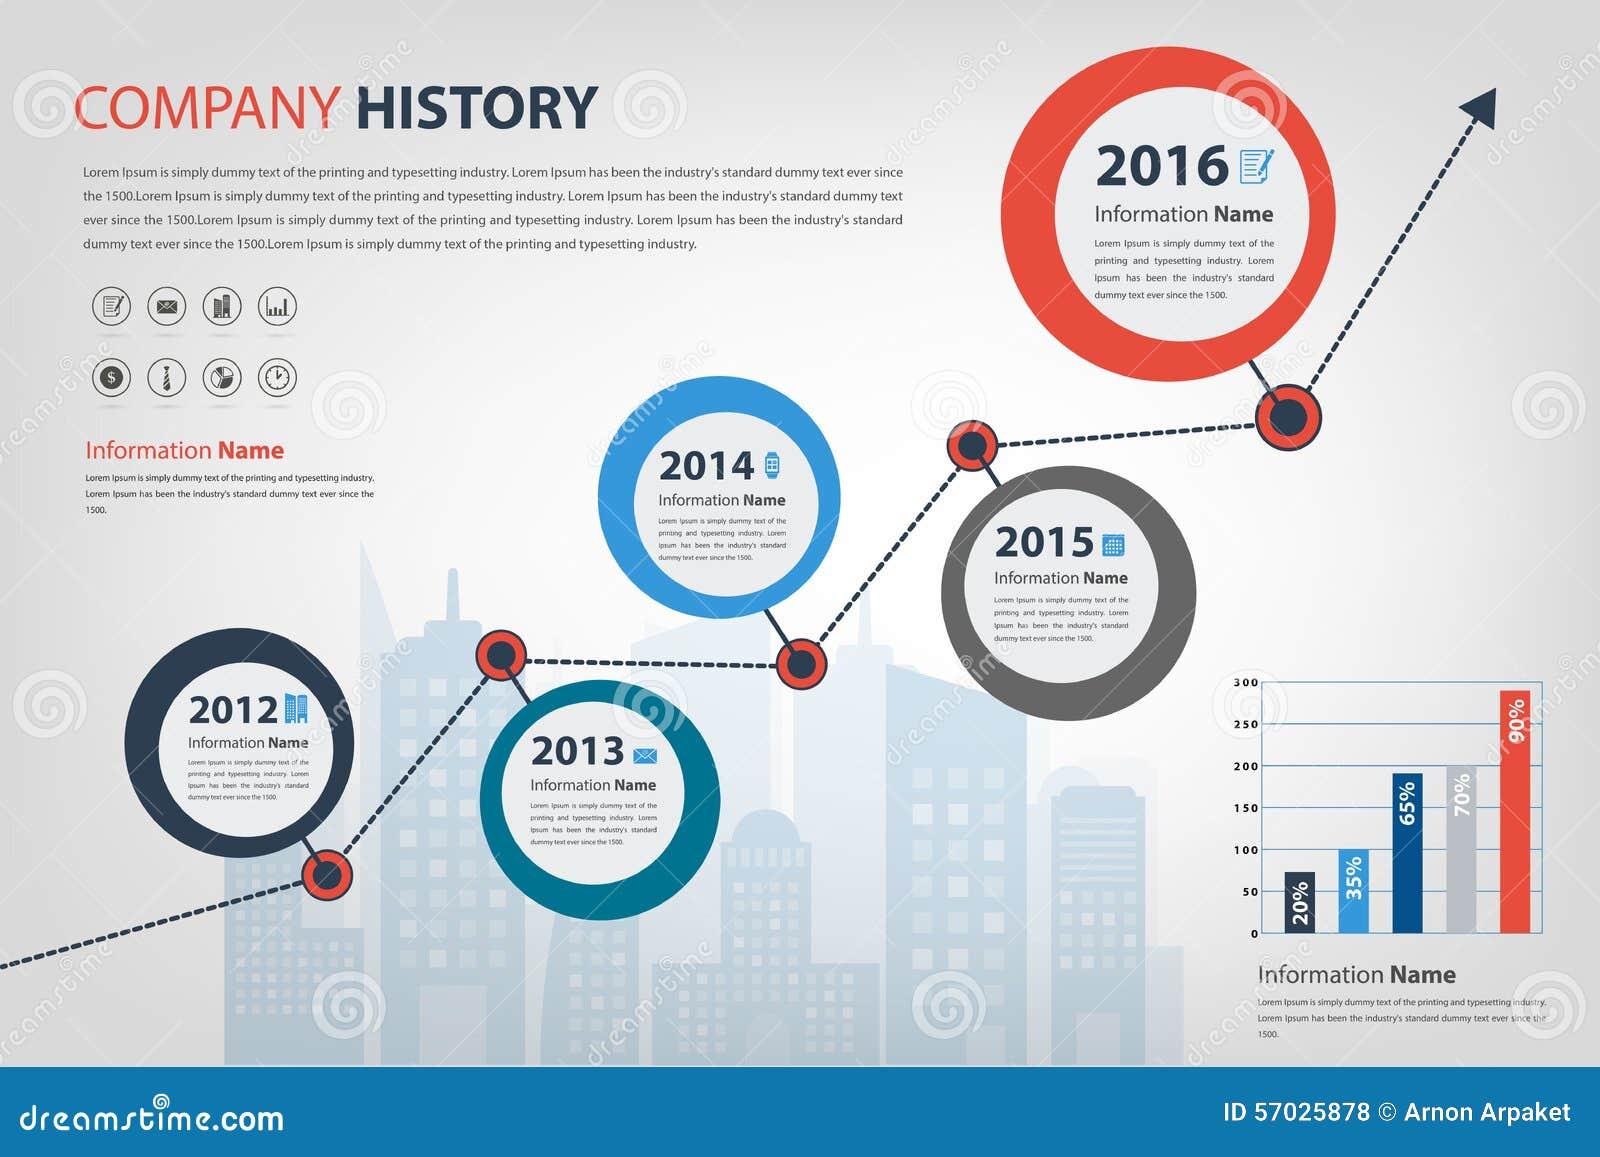 Company Timeline Template Pasoevolistco - Milestone timeline template